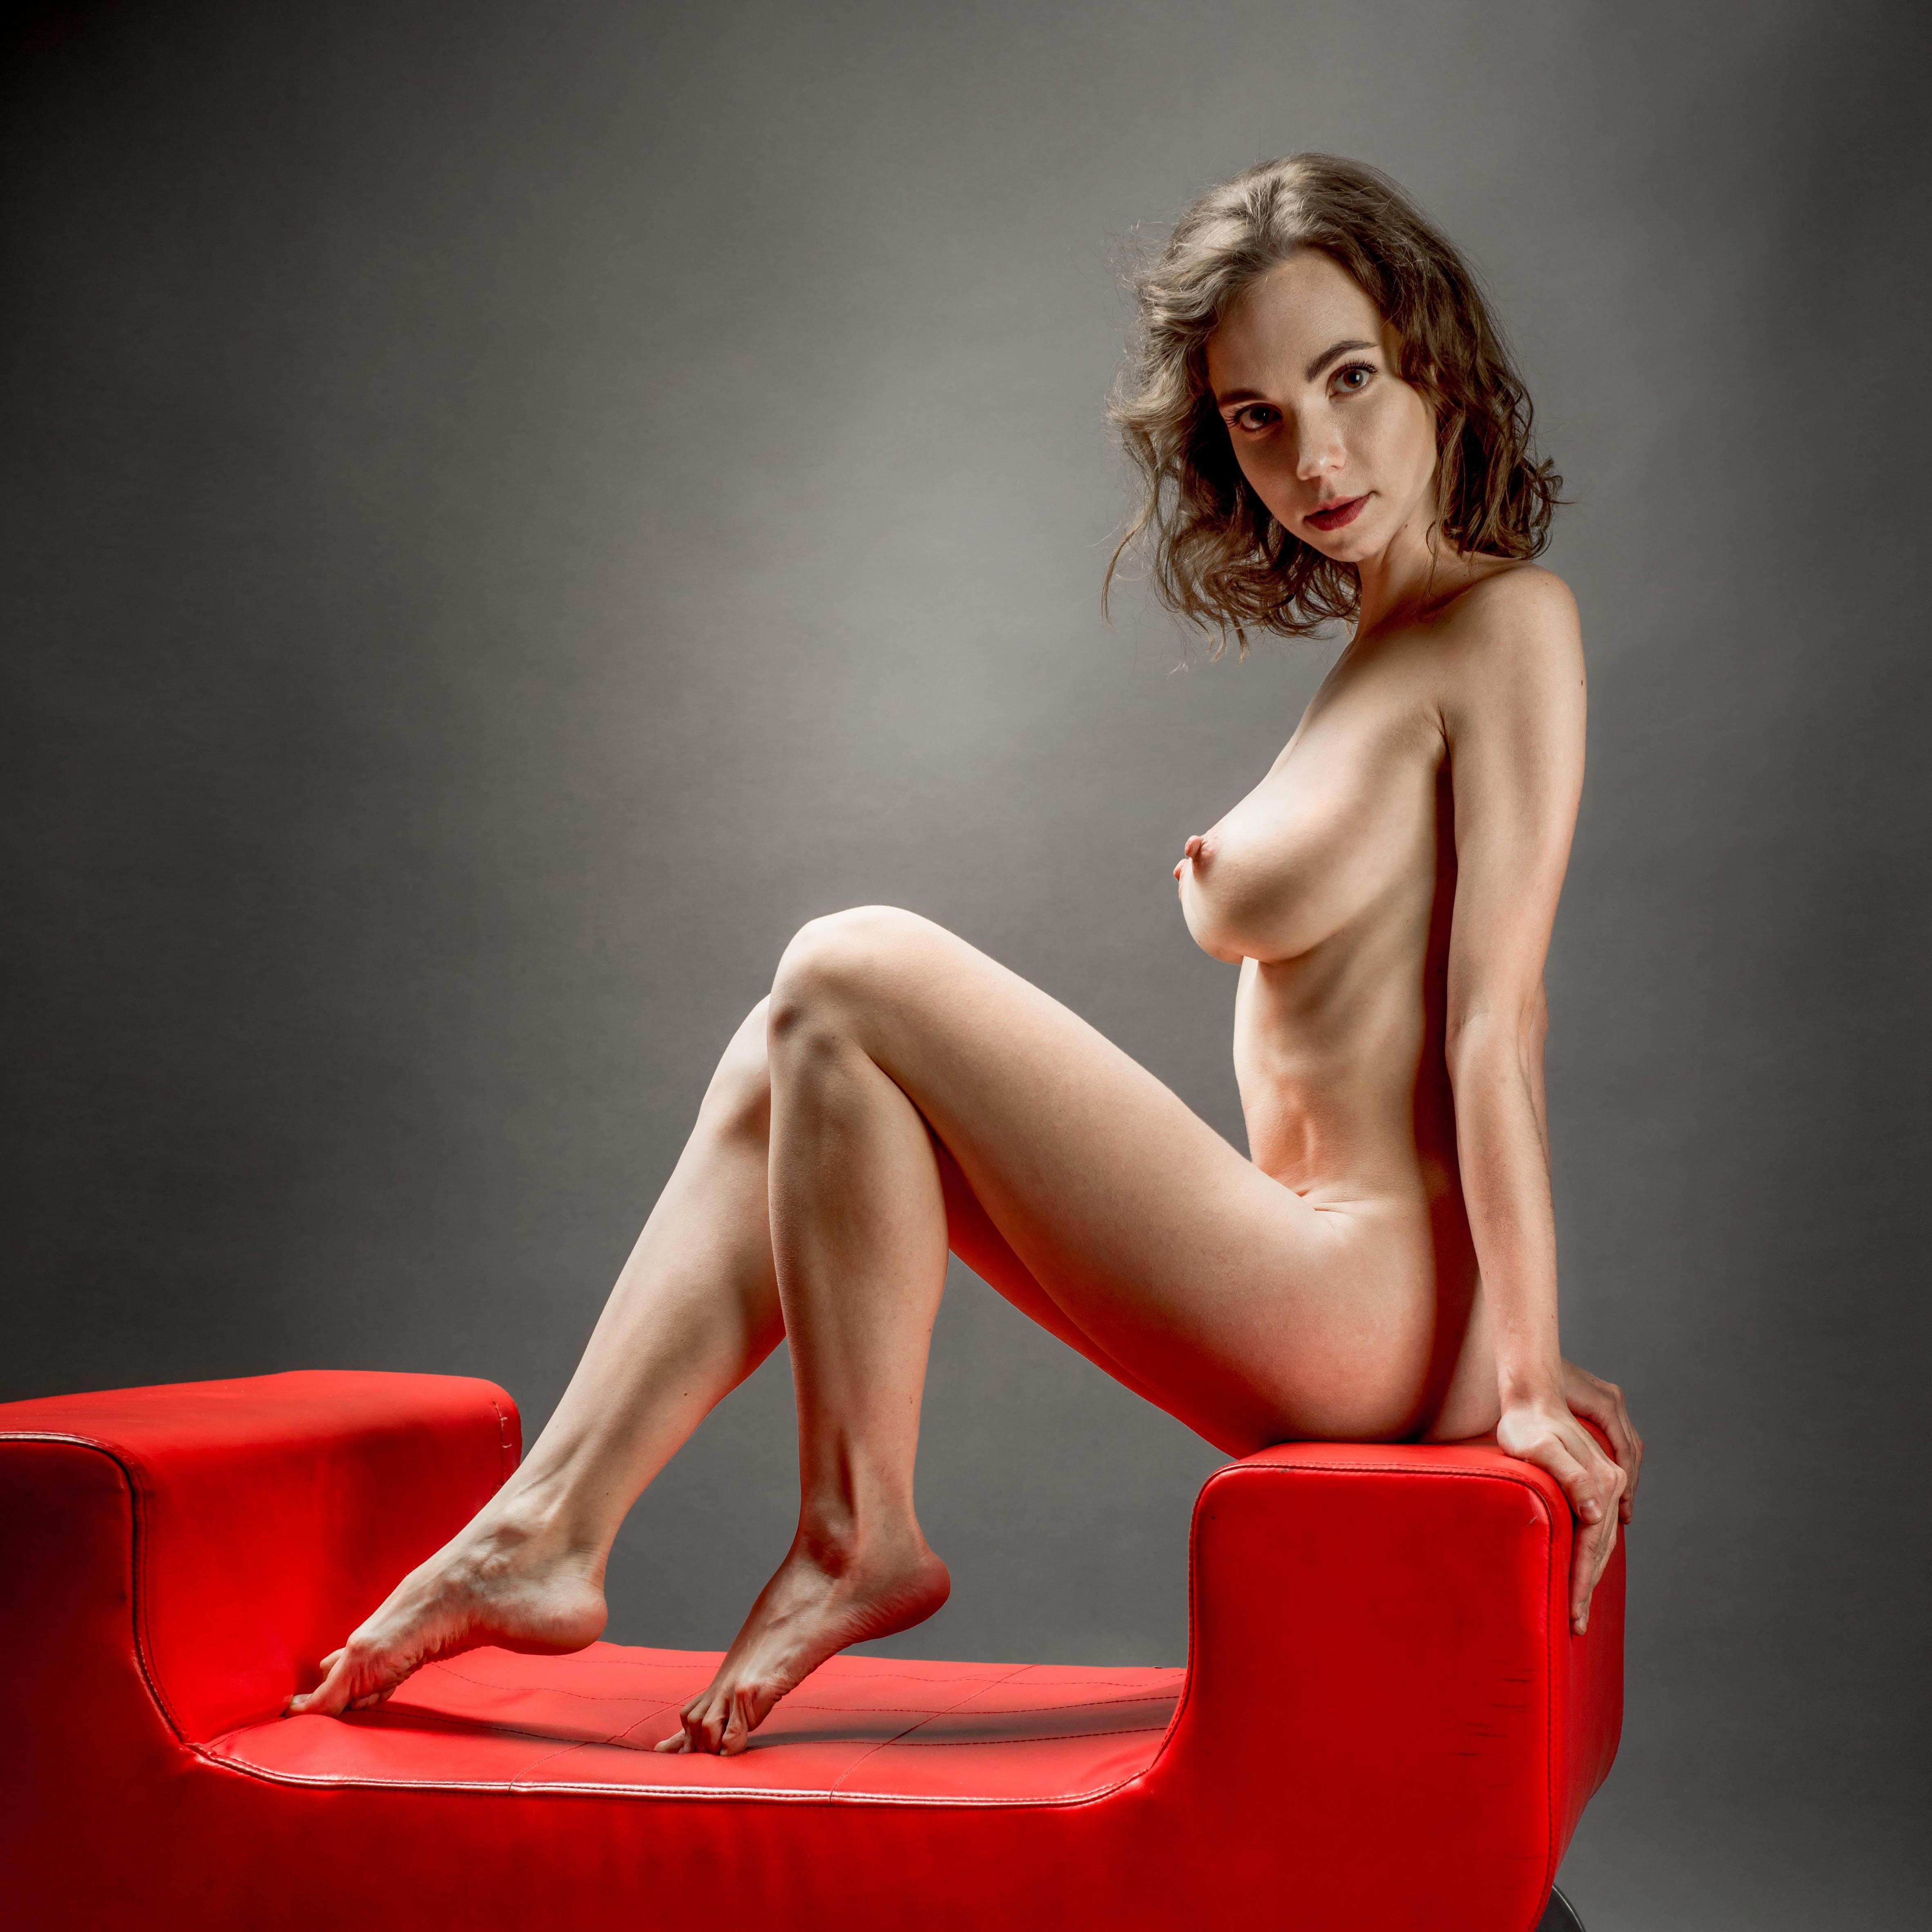 Голая Анна Меньшикова на красном диване / Anna Menshikova nude by Anton Smolsky